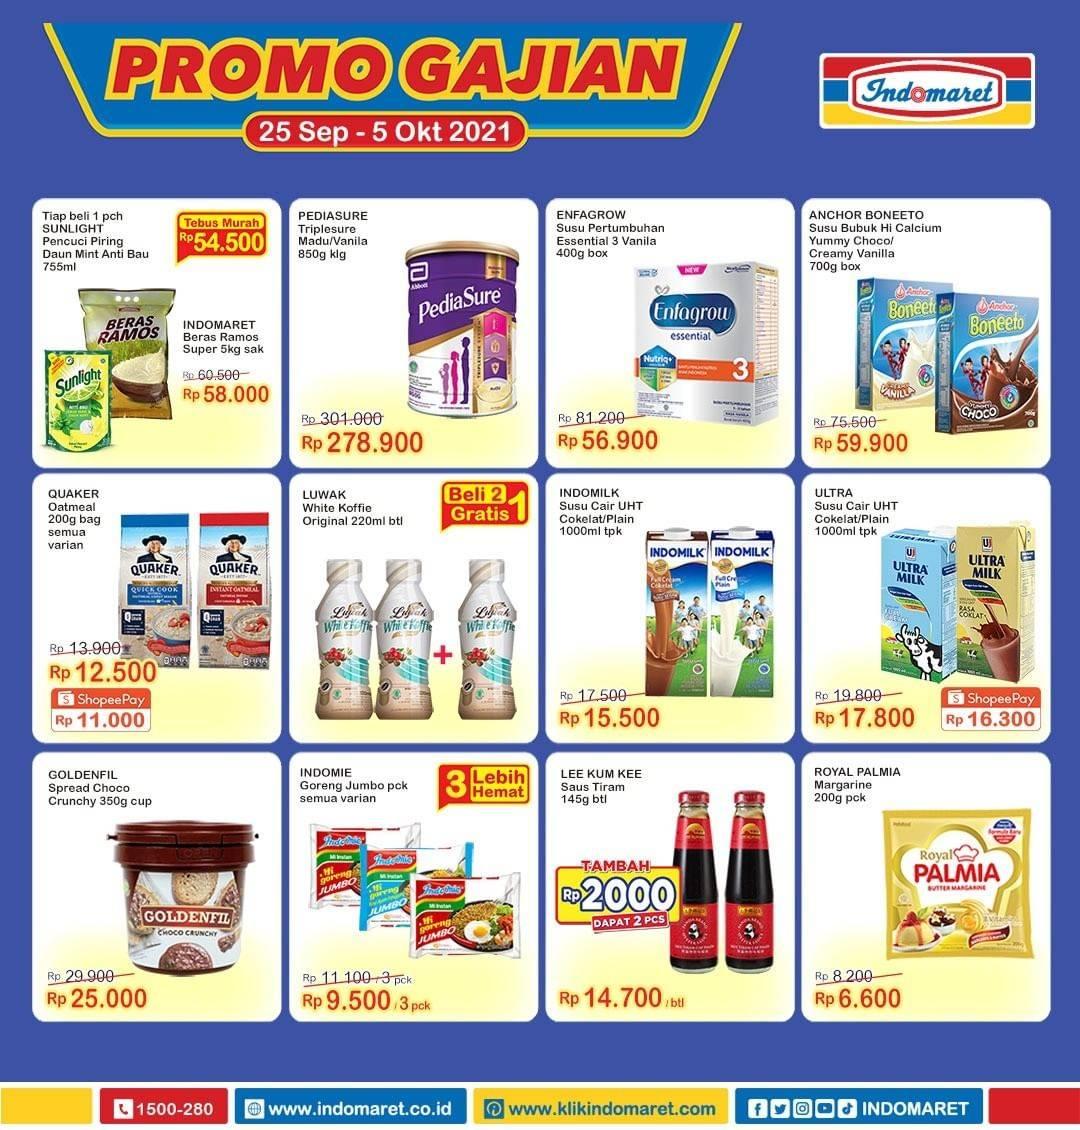 Promo diskon Katalog Indomaret Promo Gajian 25 Sept - 5 Oktober